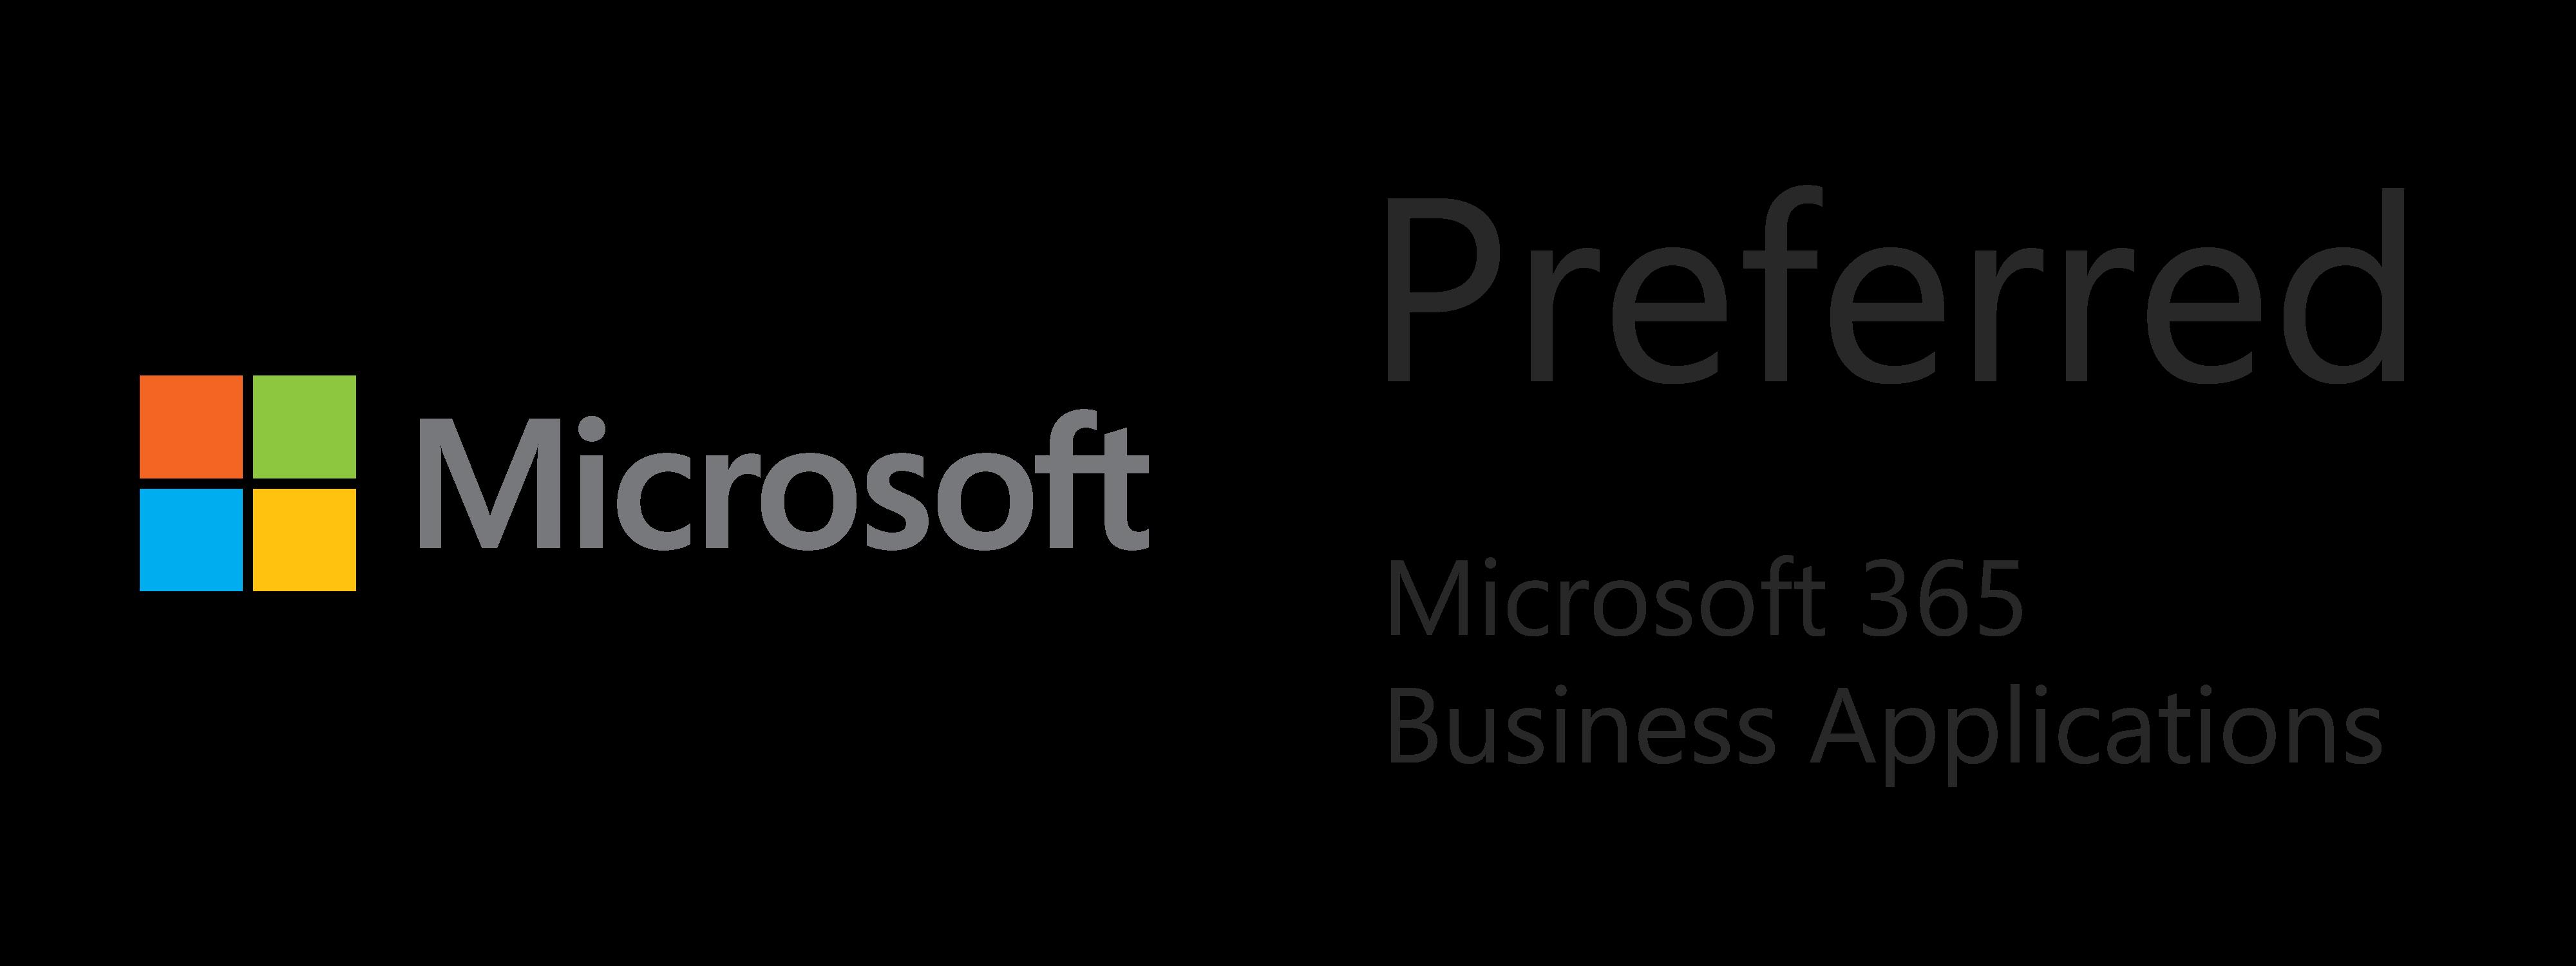 Microsoft Preferred Business Applications - Microsoft Gold Partner